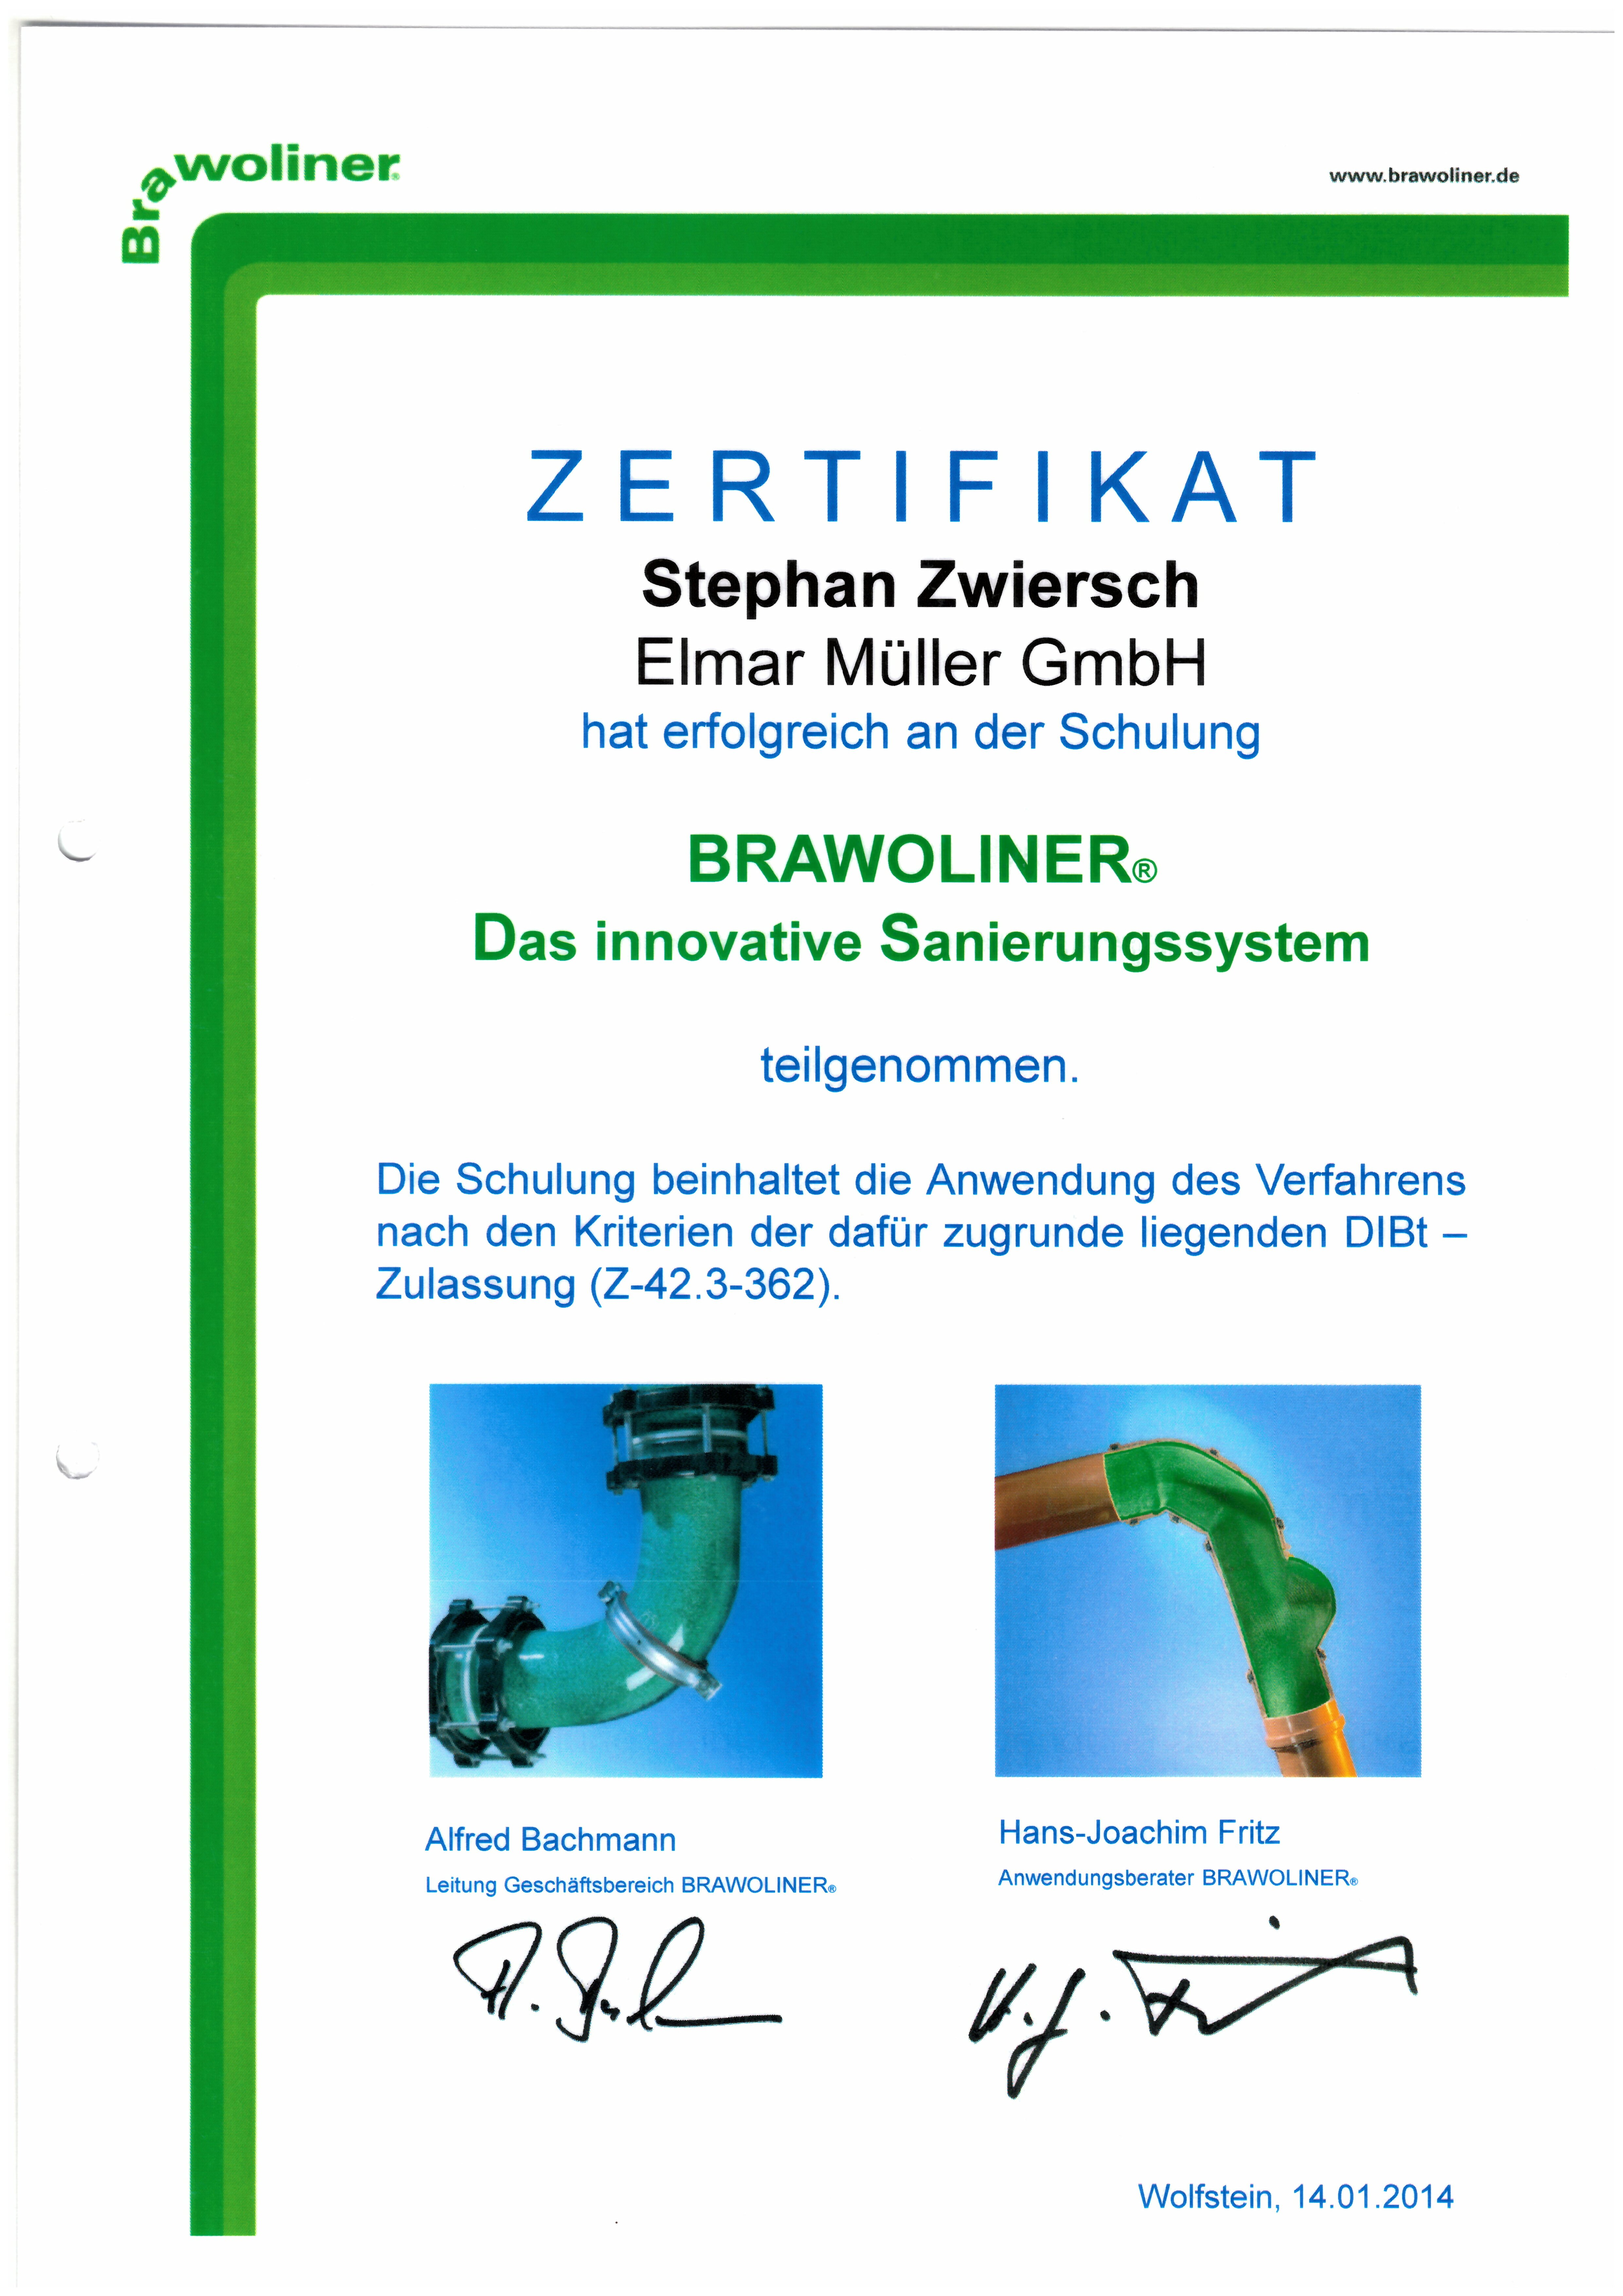 Zertifikat - Brawoliner das innovative Sanierungssystem - Zwiersch